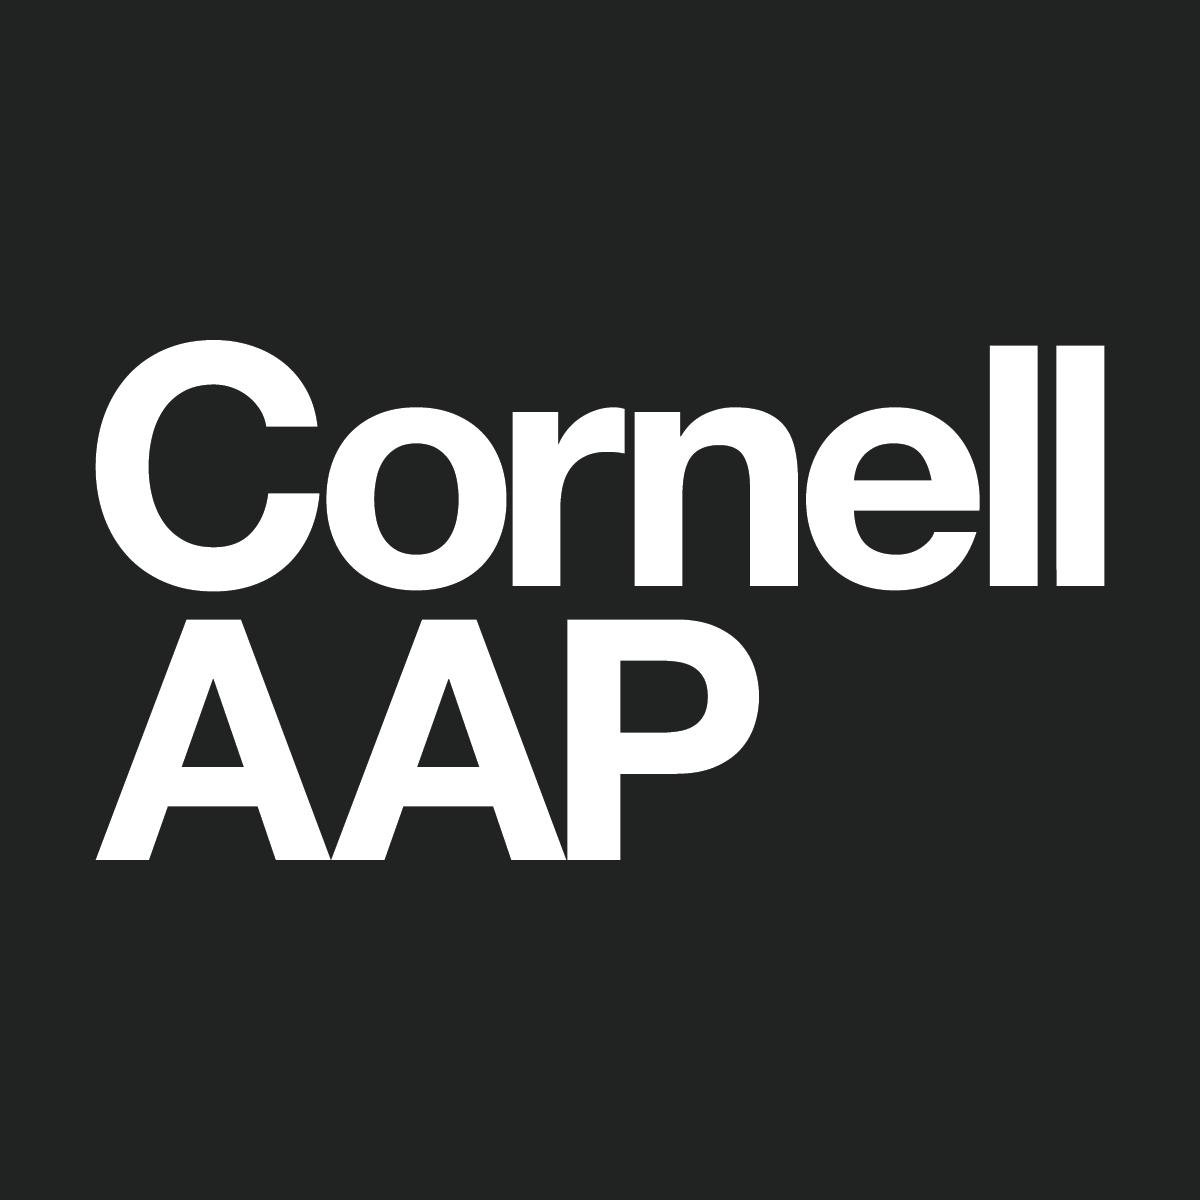 Undergraduate Admissions: Architecture | Cornell AAP